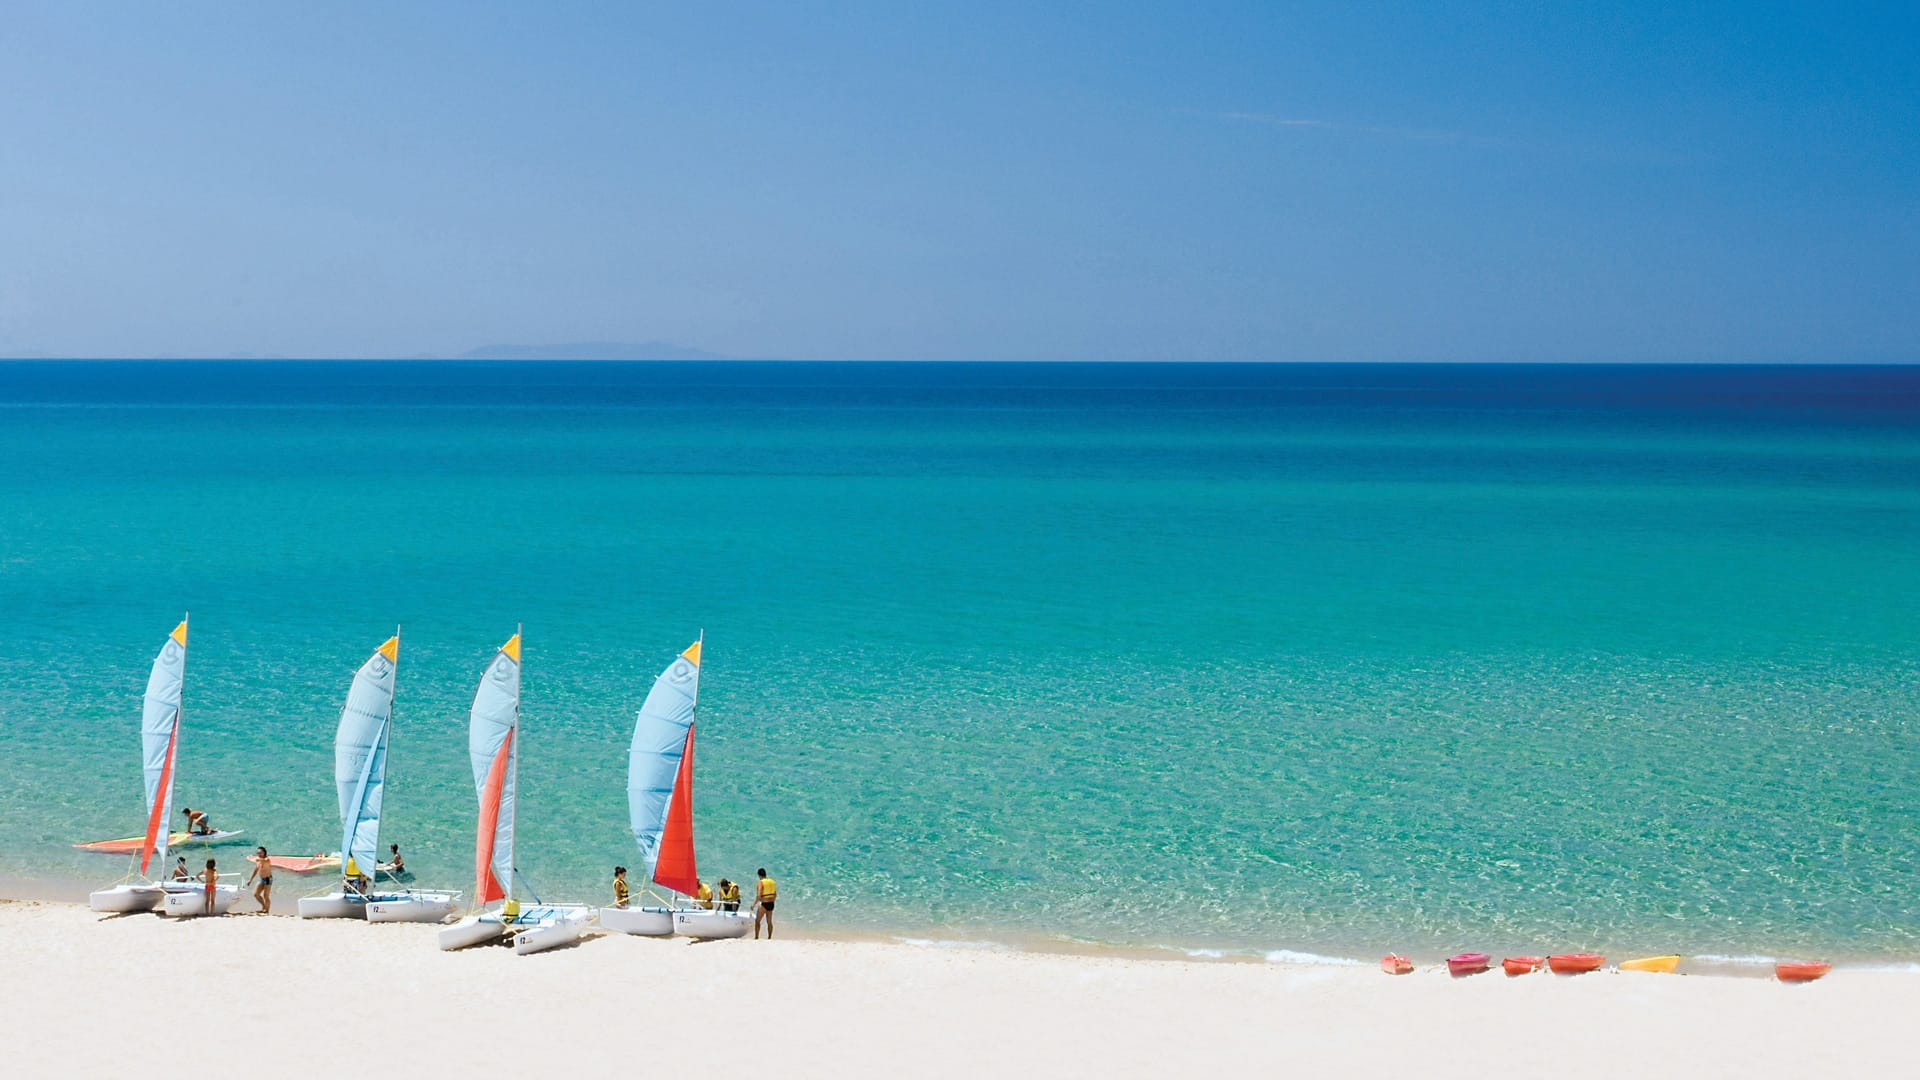 resort-le-dune-sport-catamarani-sardegna-960